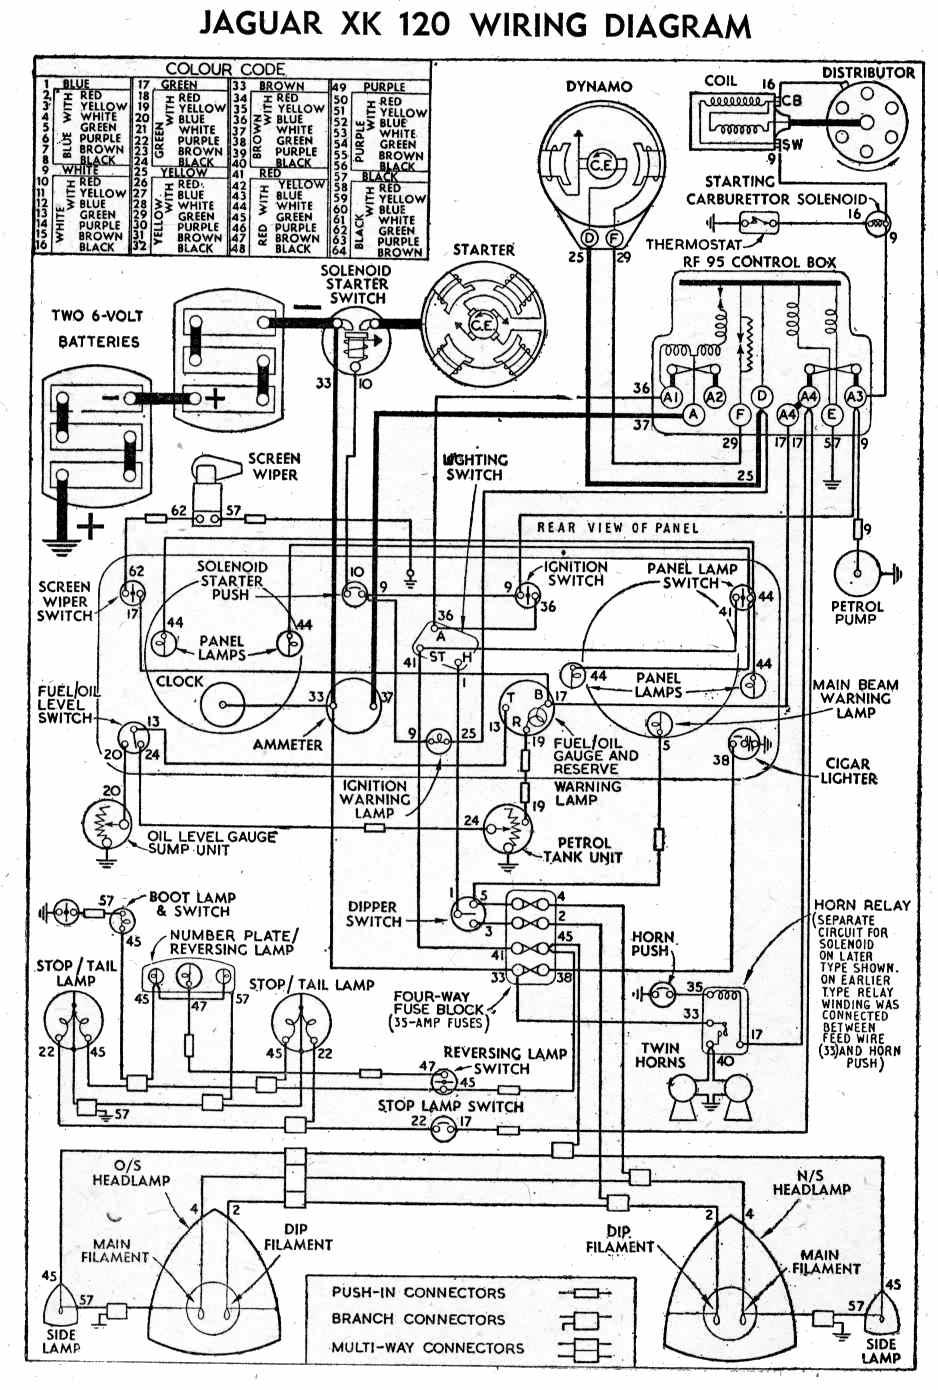 Xk150 Wiring Diagram Third Level Guitar Cab Jaguar Light Simple